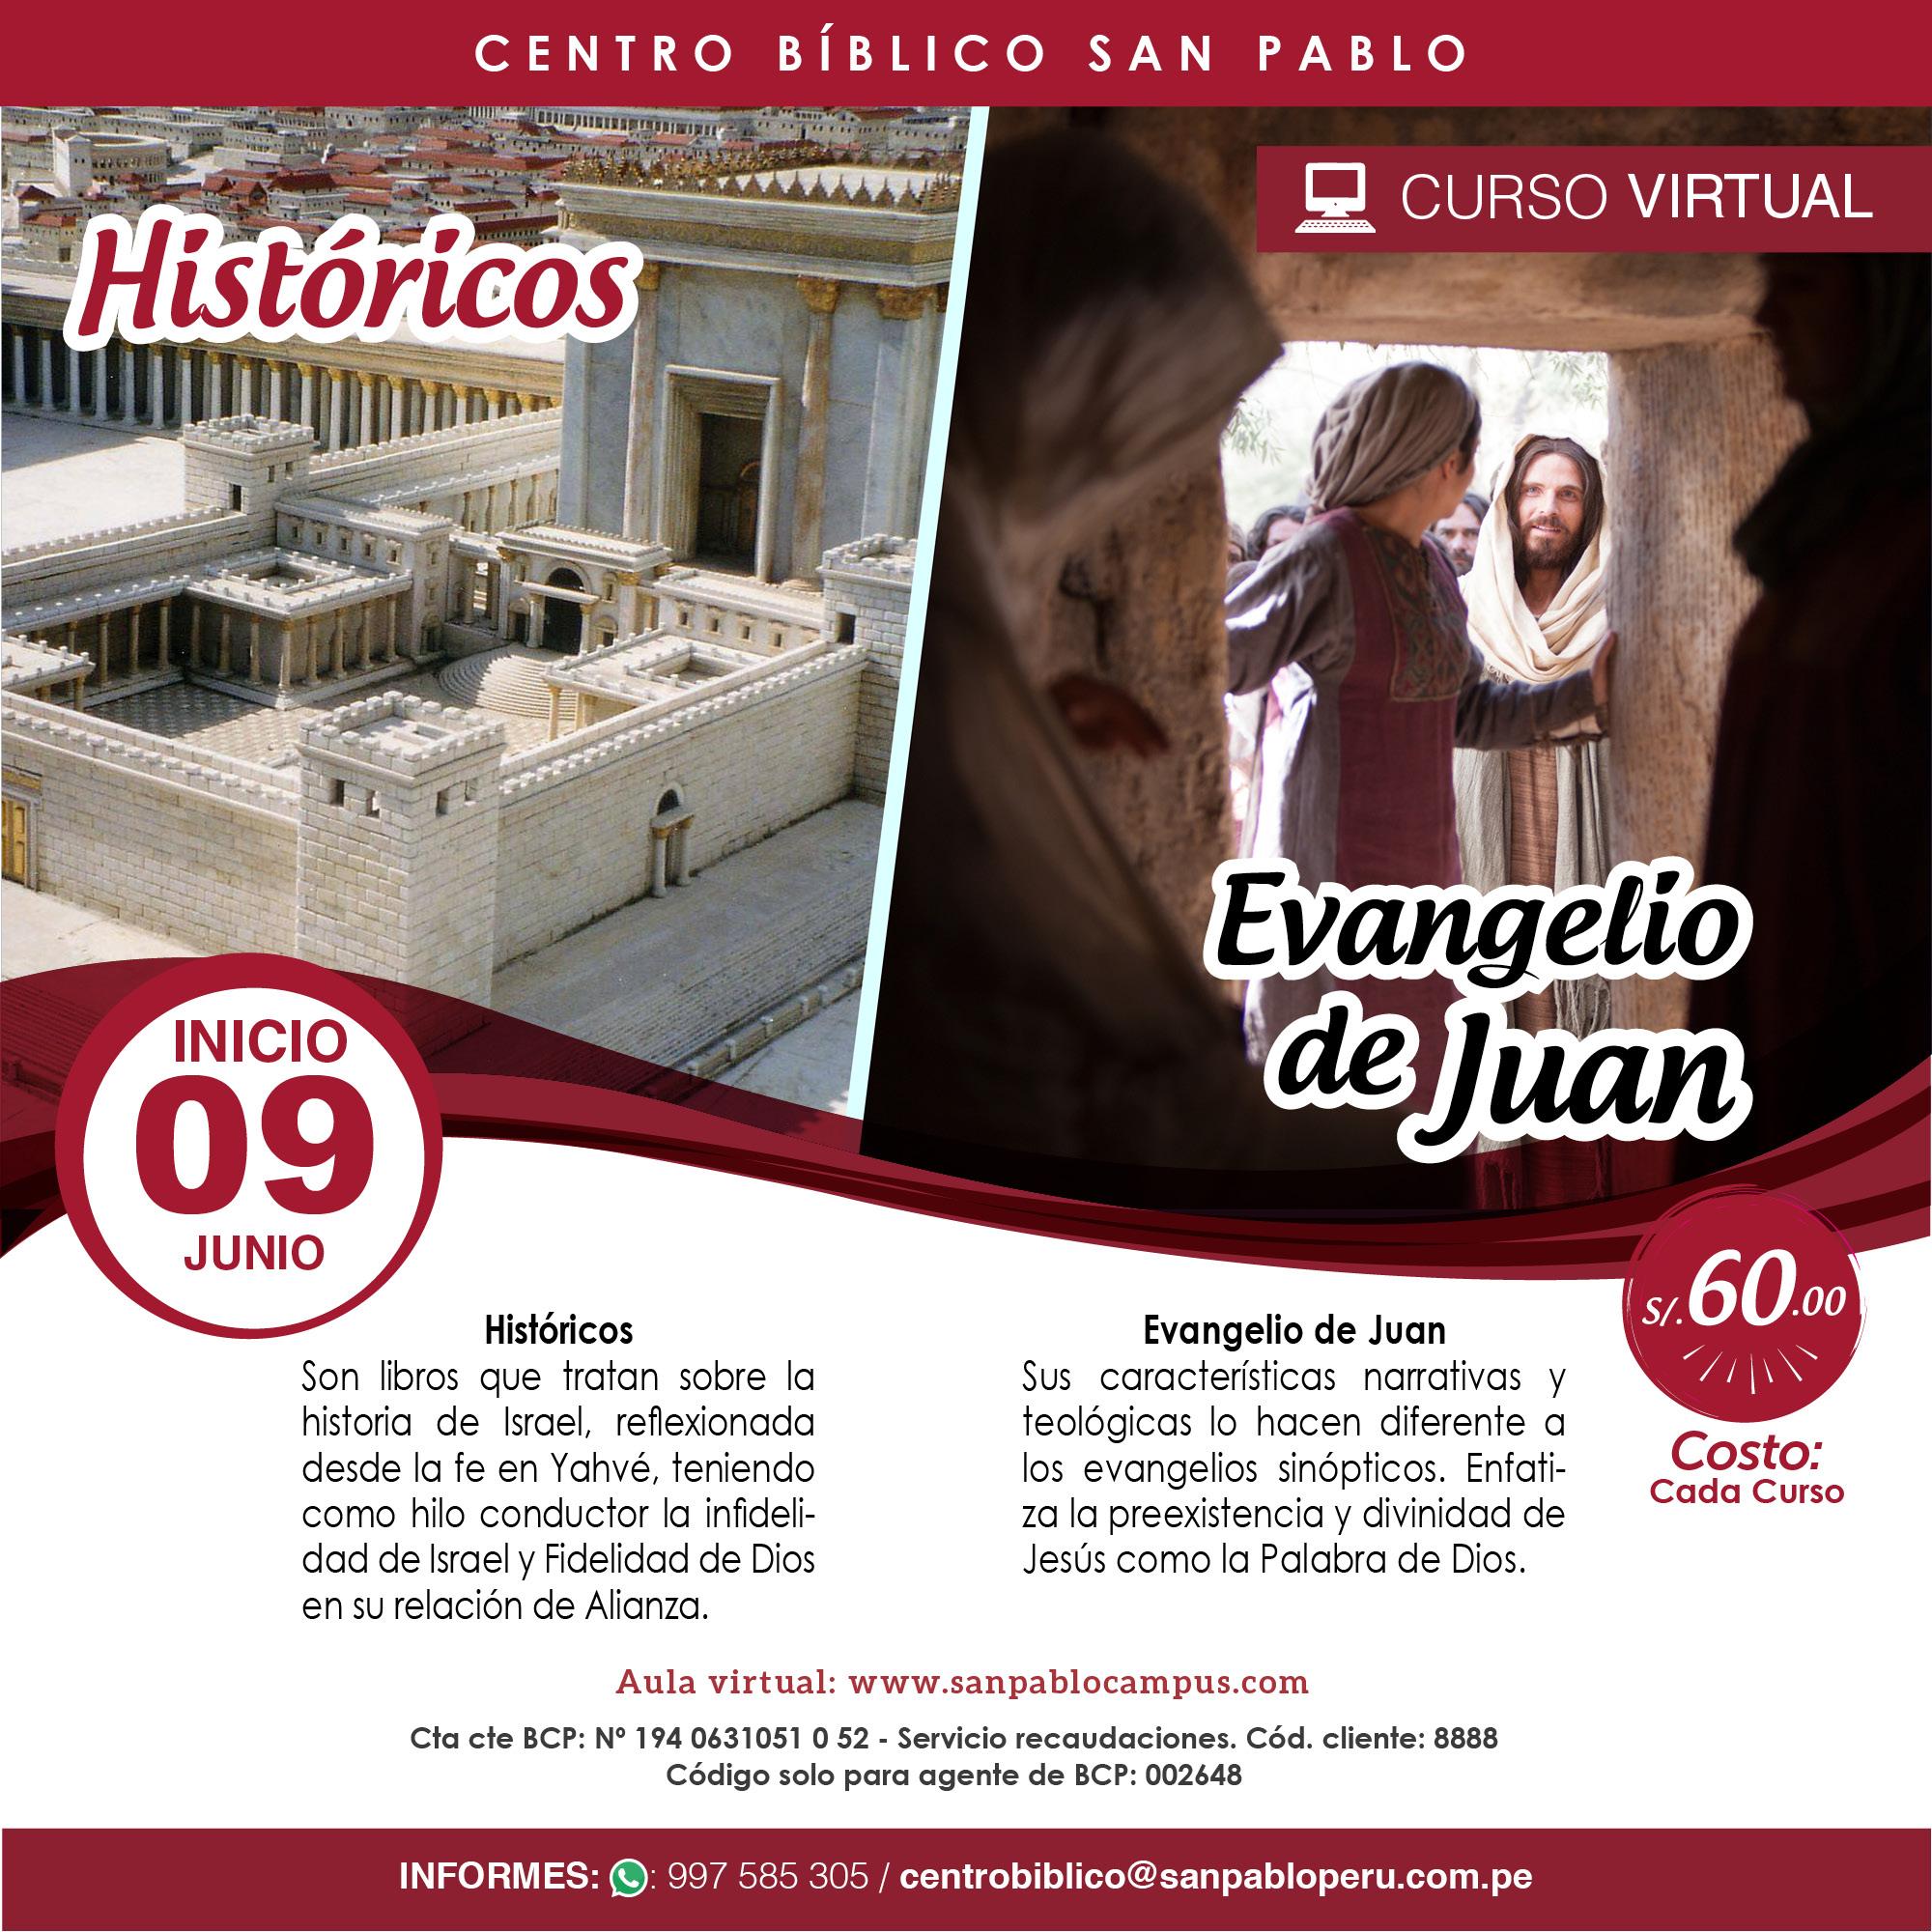 "Curso Virtual: ""Históricos / Evangelio de Juan"